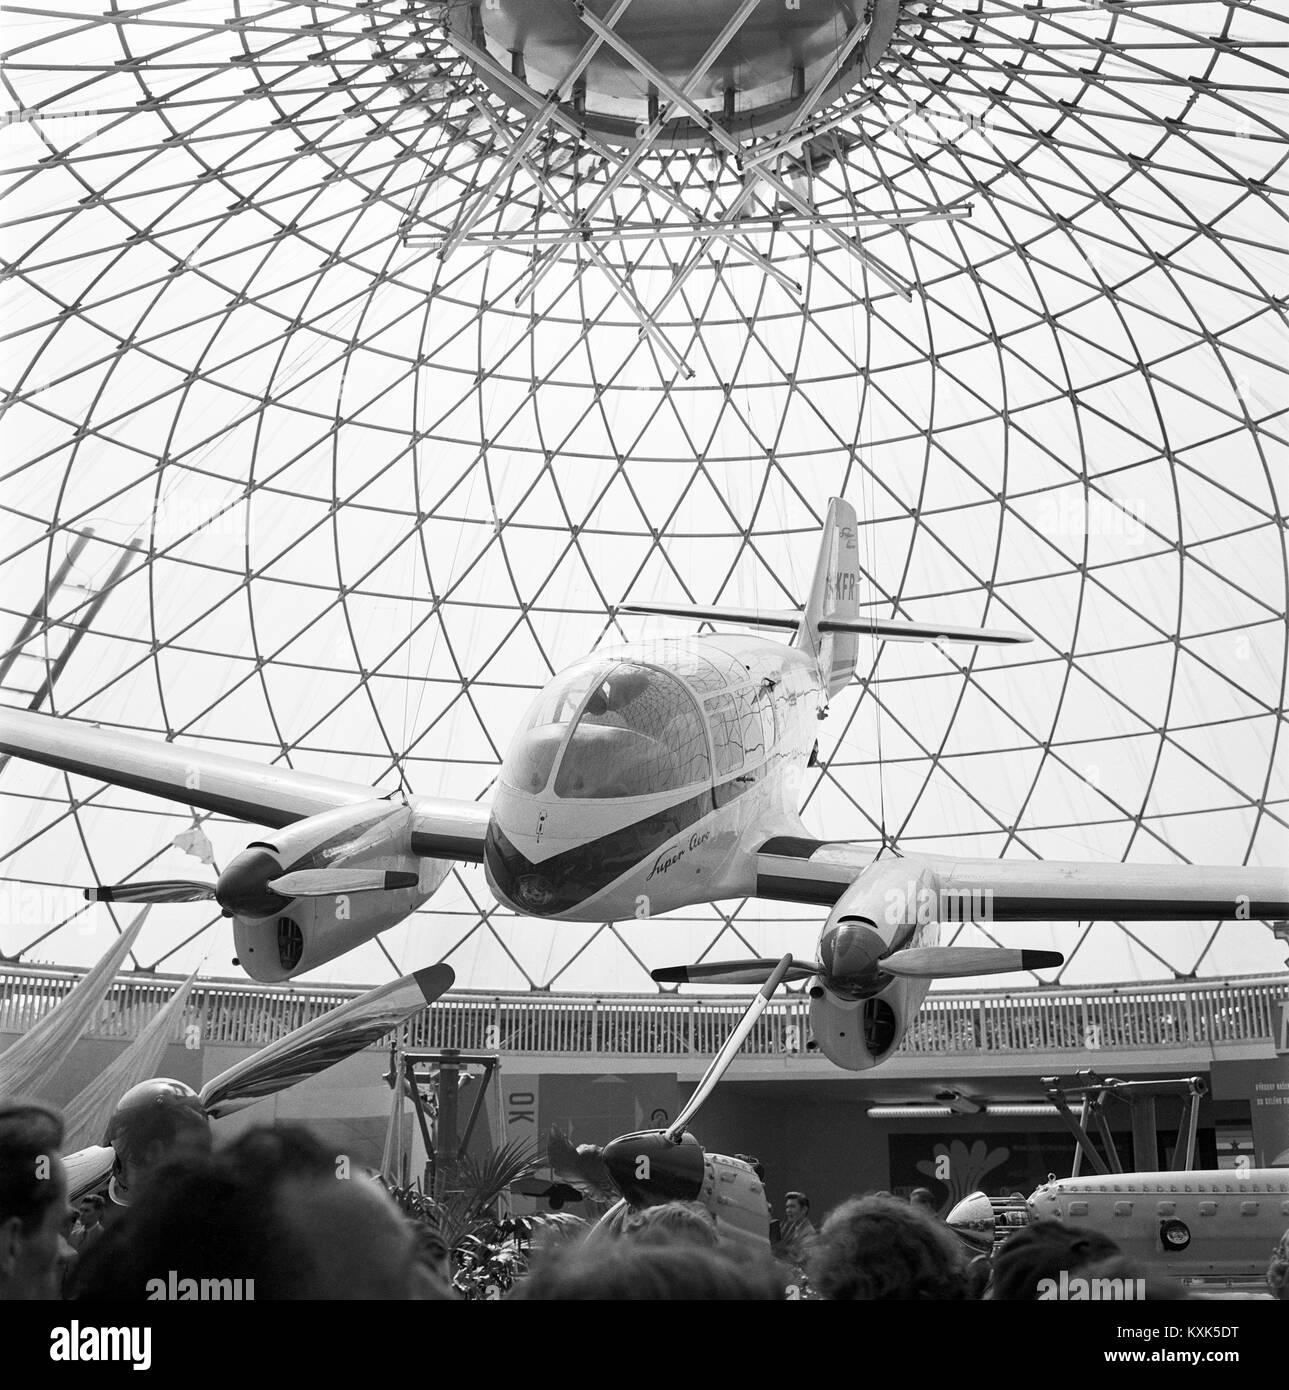 III Exhibition of Czechoslovak Engineering,Aero Ae-45 aircraft,aerotaxi Aero-Super - Stock Image